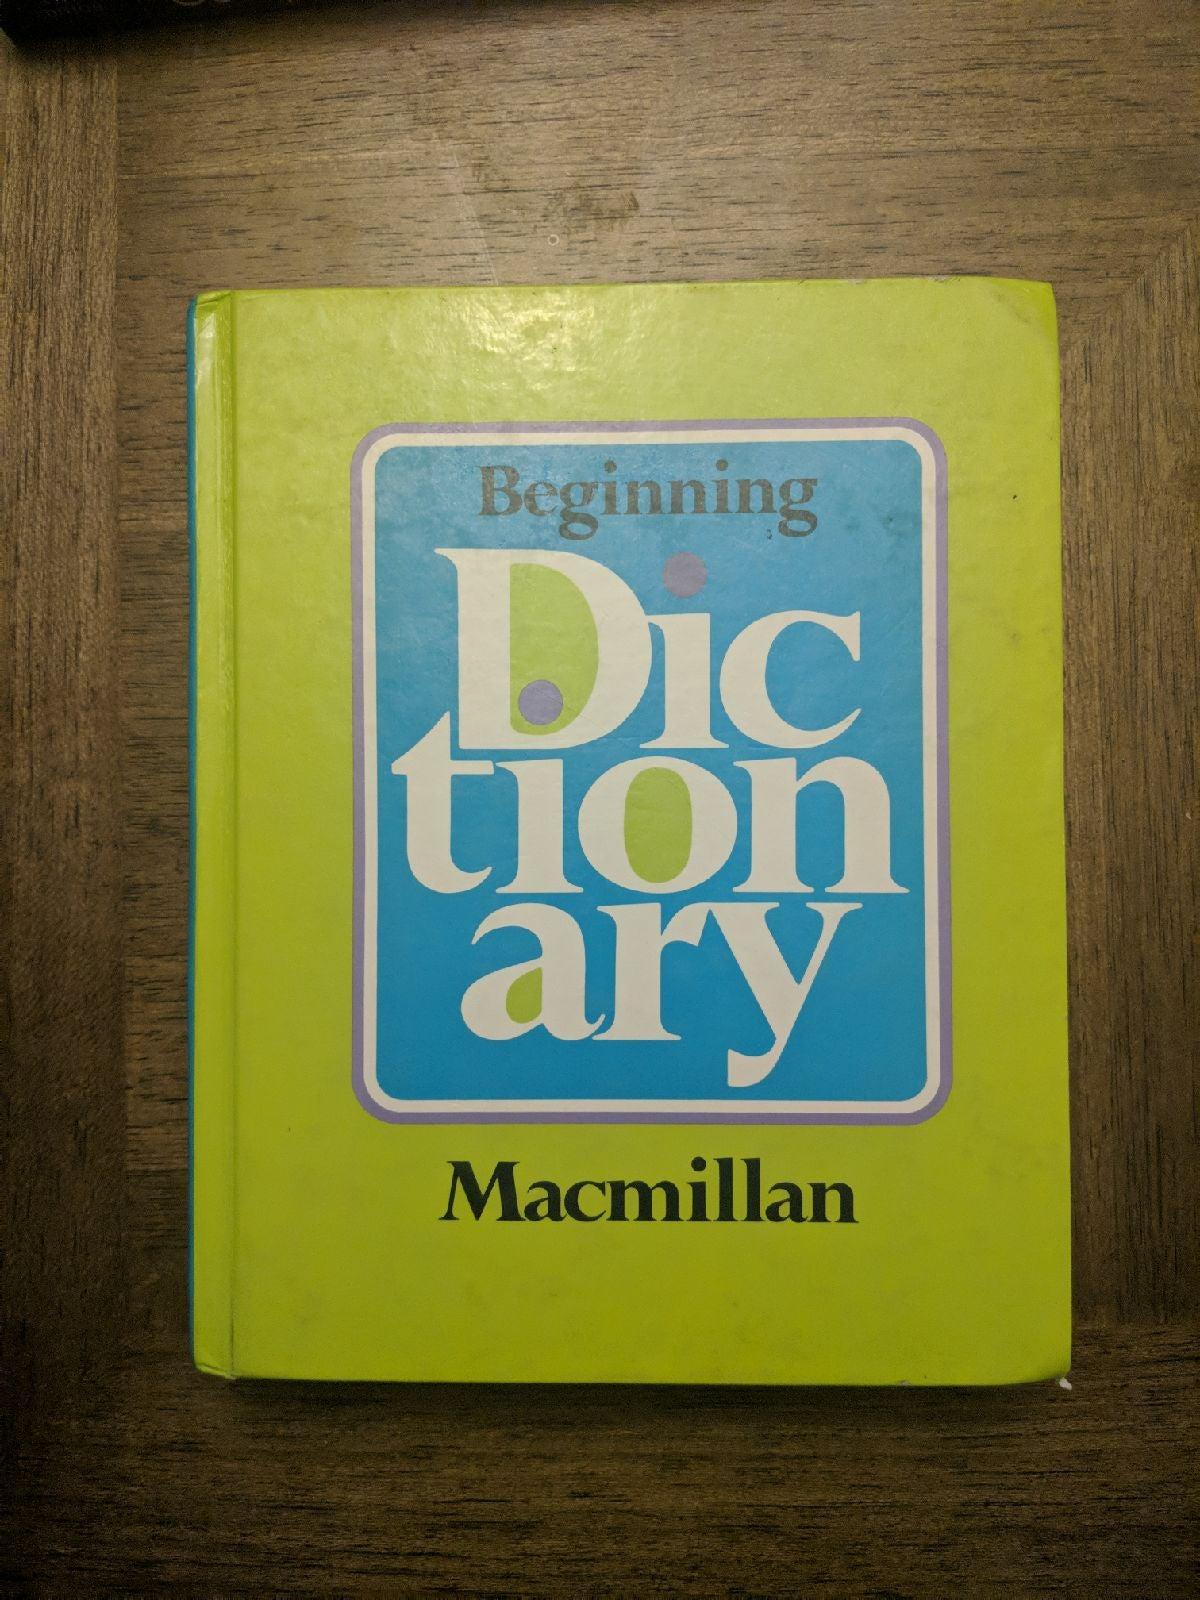 Macmillan Kids Dictionary with diagrams